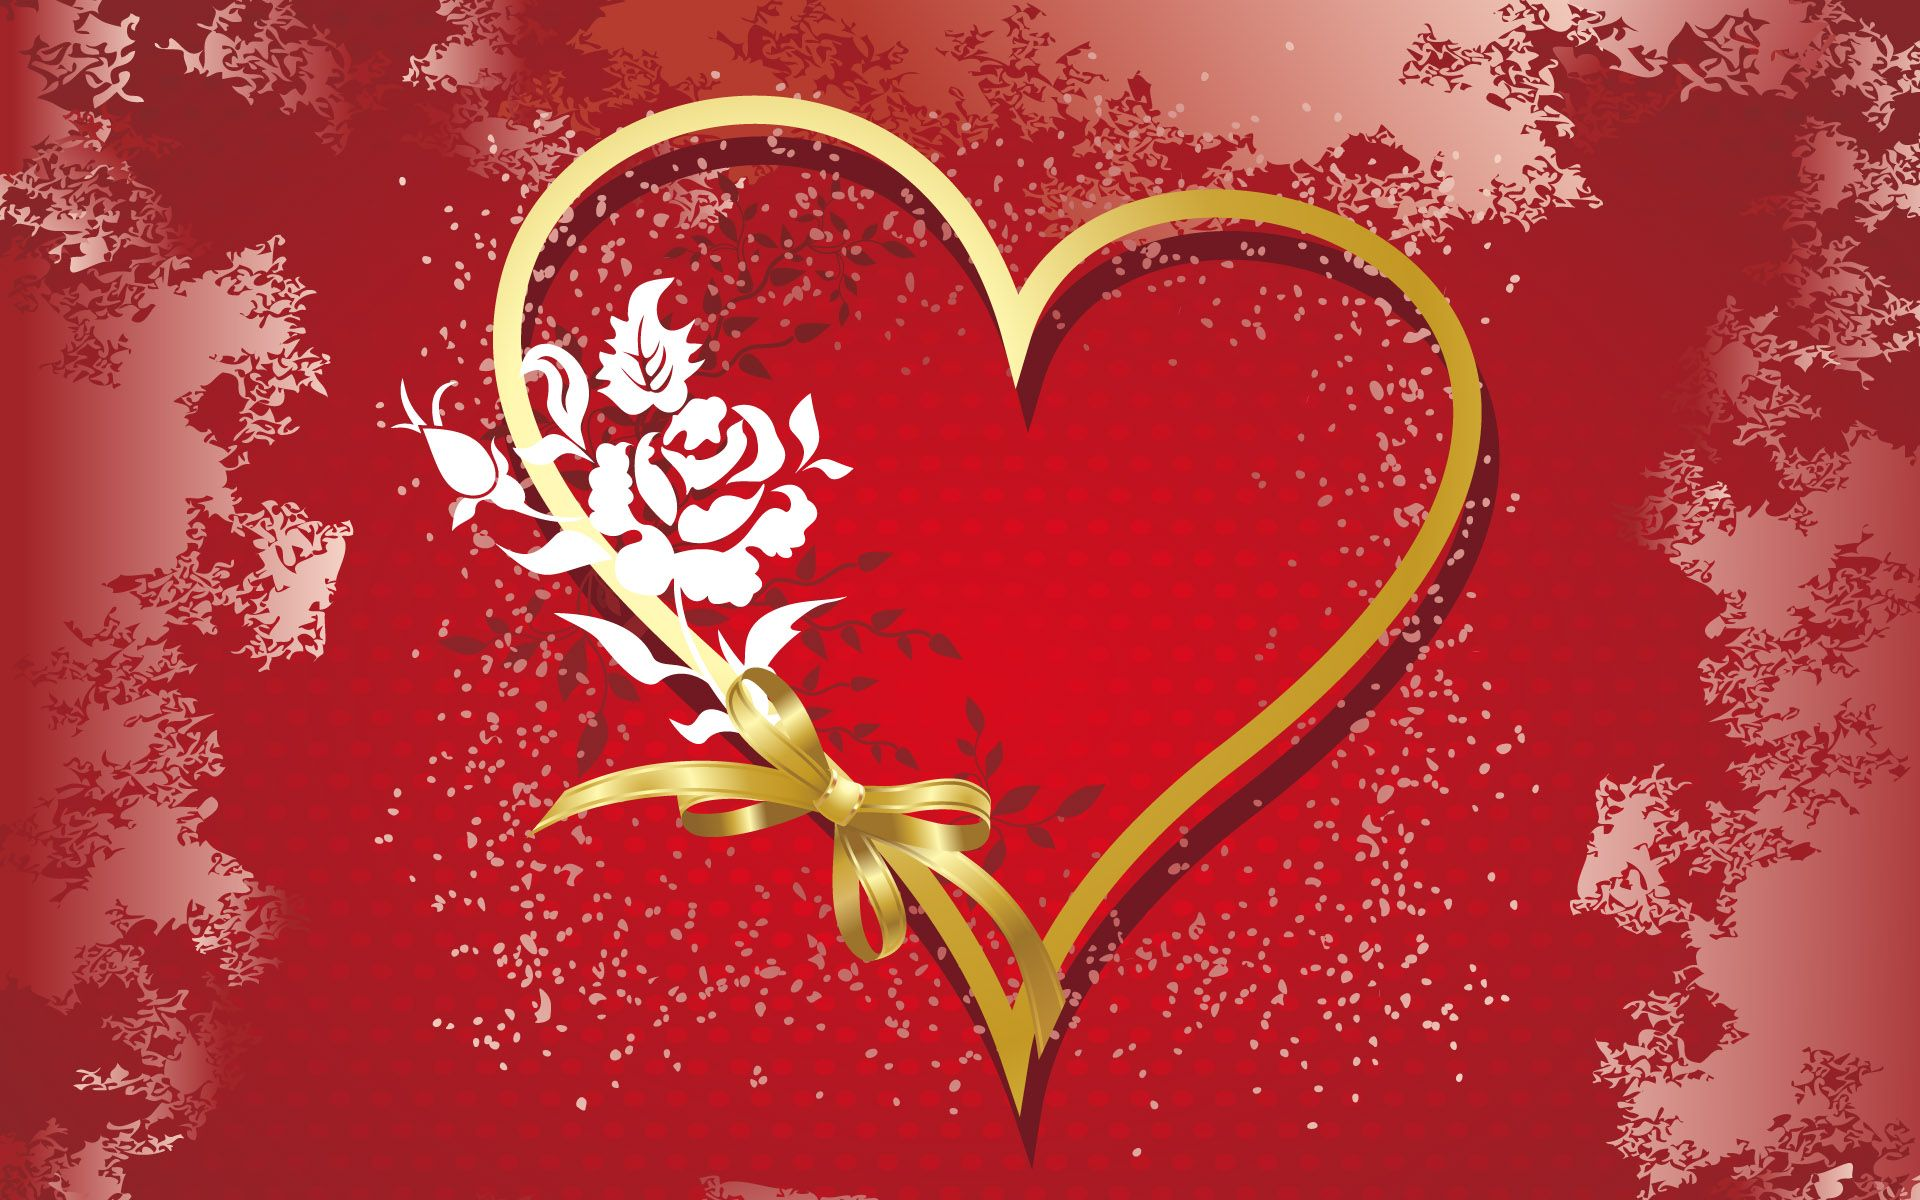 Free download best valentines love wallpaper best valentines love free download best valentines love wallpaper best valentines love wallpaper for desktop please your kristyandbryce Image collections